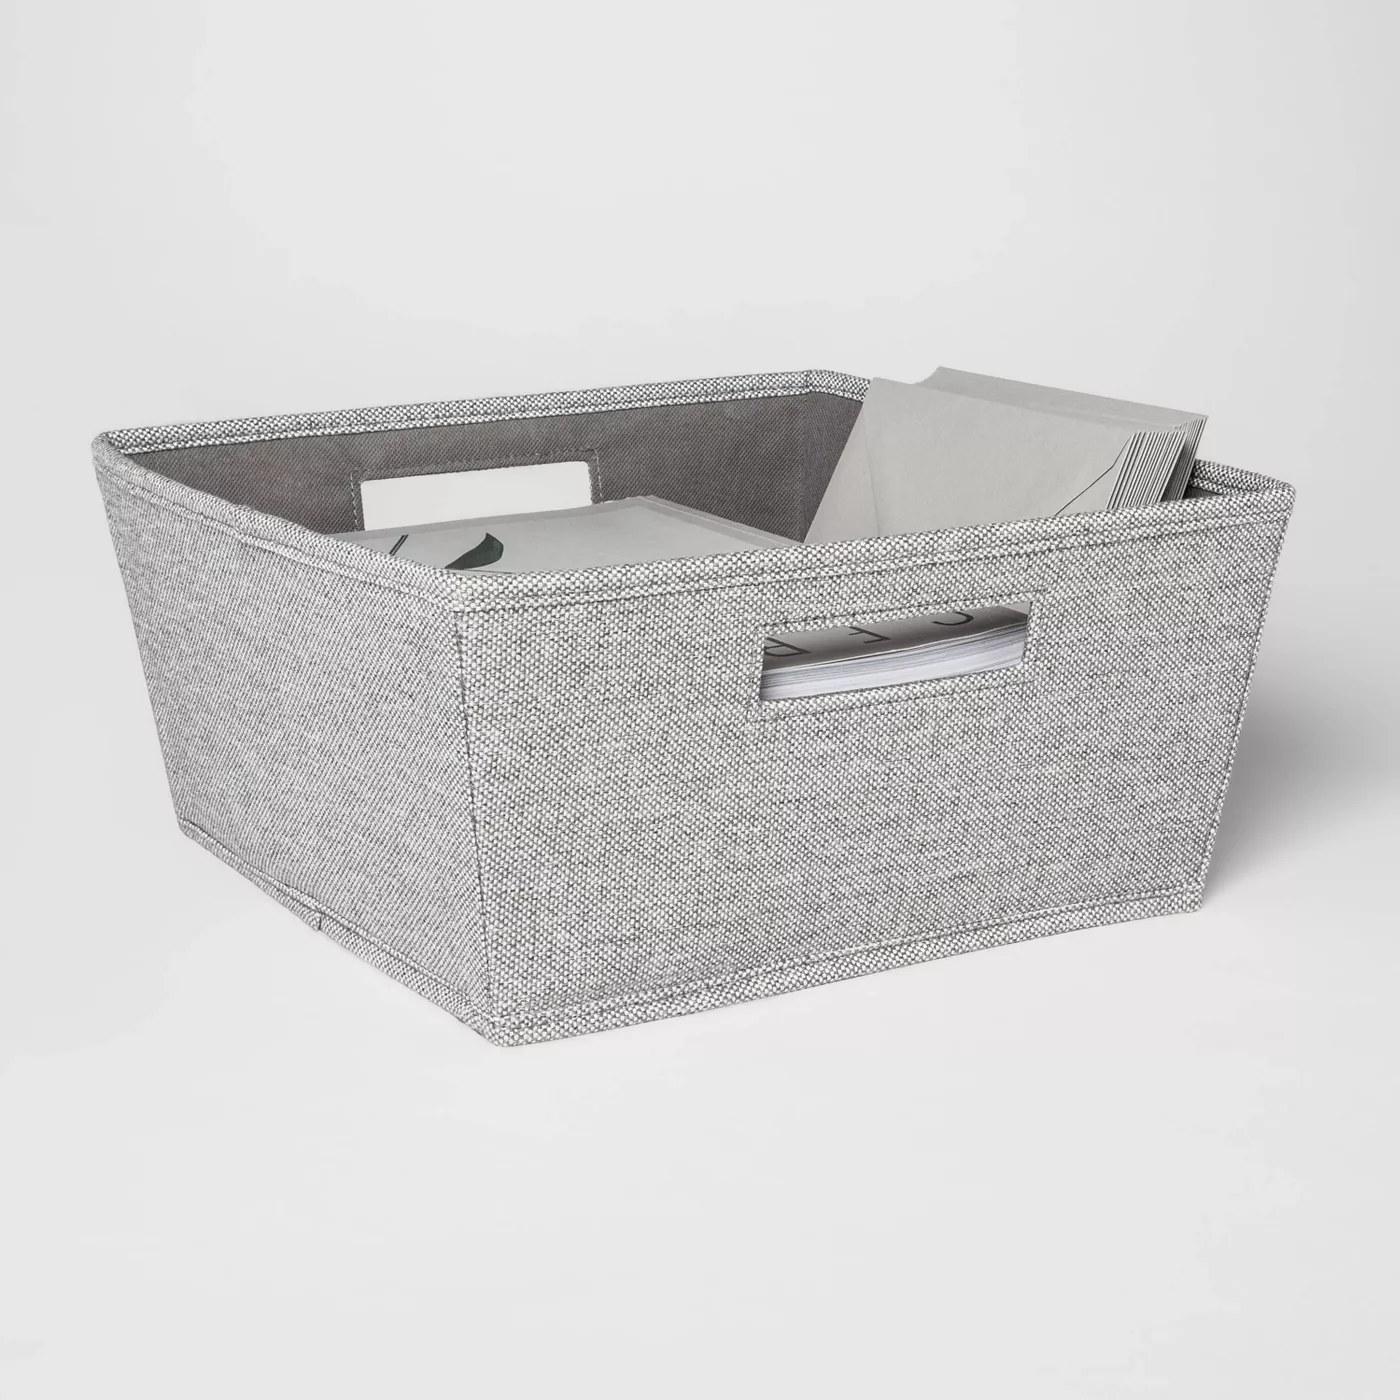 The gray bin